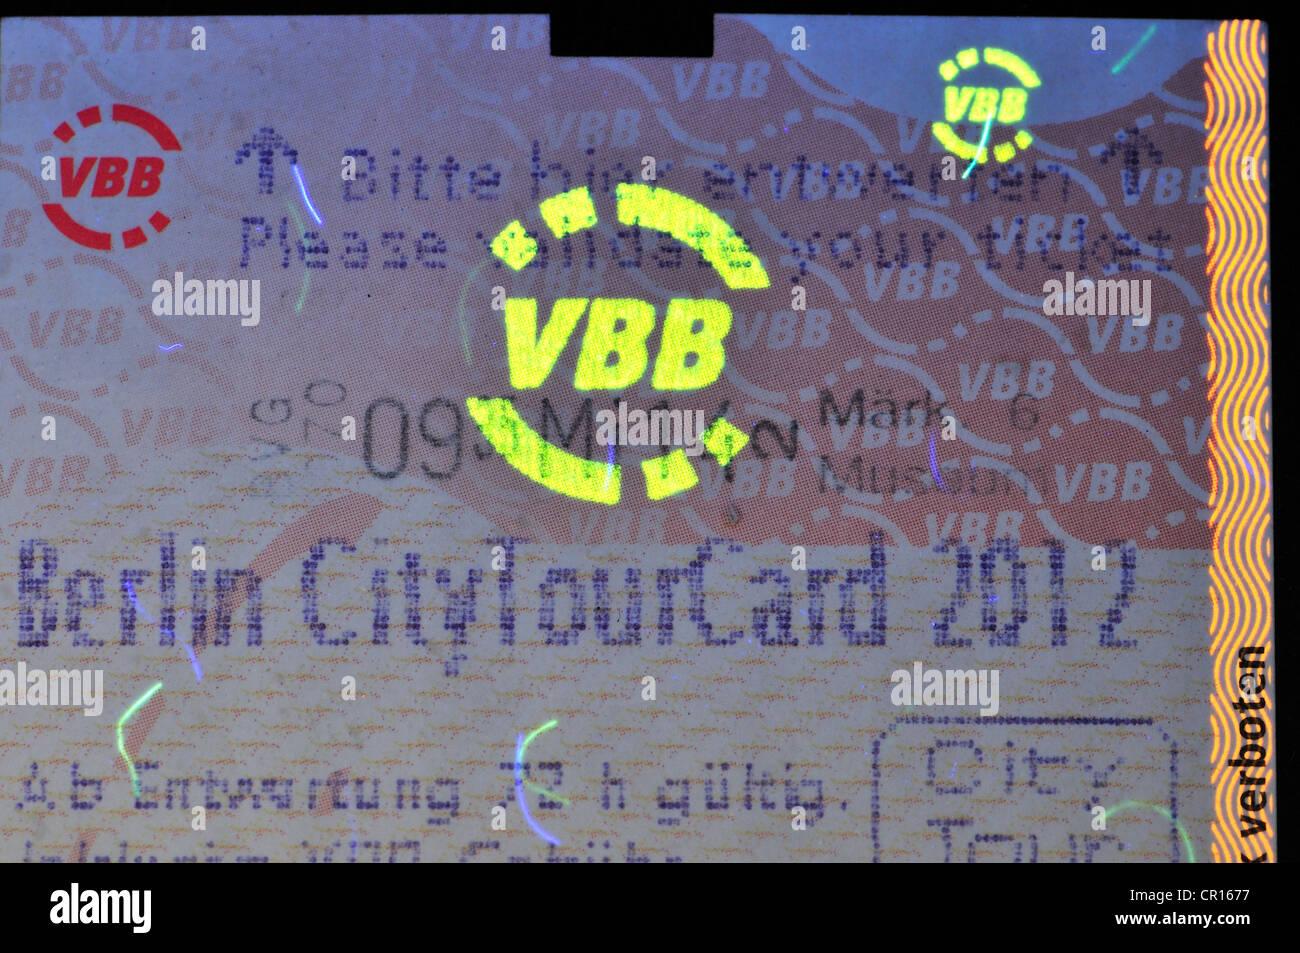 Berlin transport ticket showing security features under ultraviolet light - Stock Image